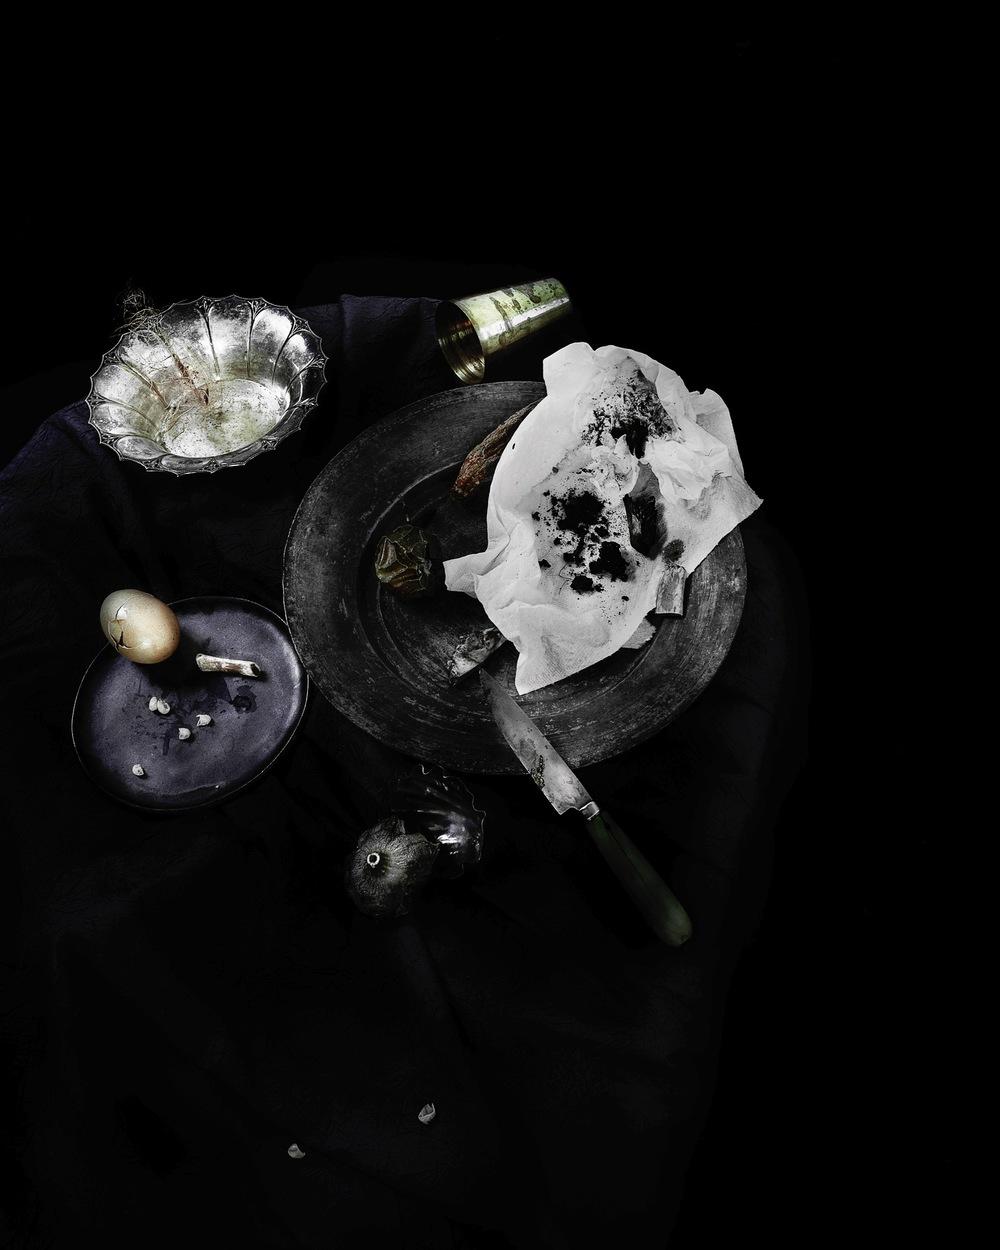 Aerial View 俯瞰, 2014,archival pigment print on fine art paper 收藏级艺术微喷,30 x 24 in. (76 x 61 cm) edition of 12 + 2 AP